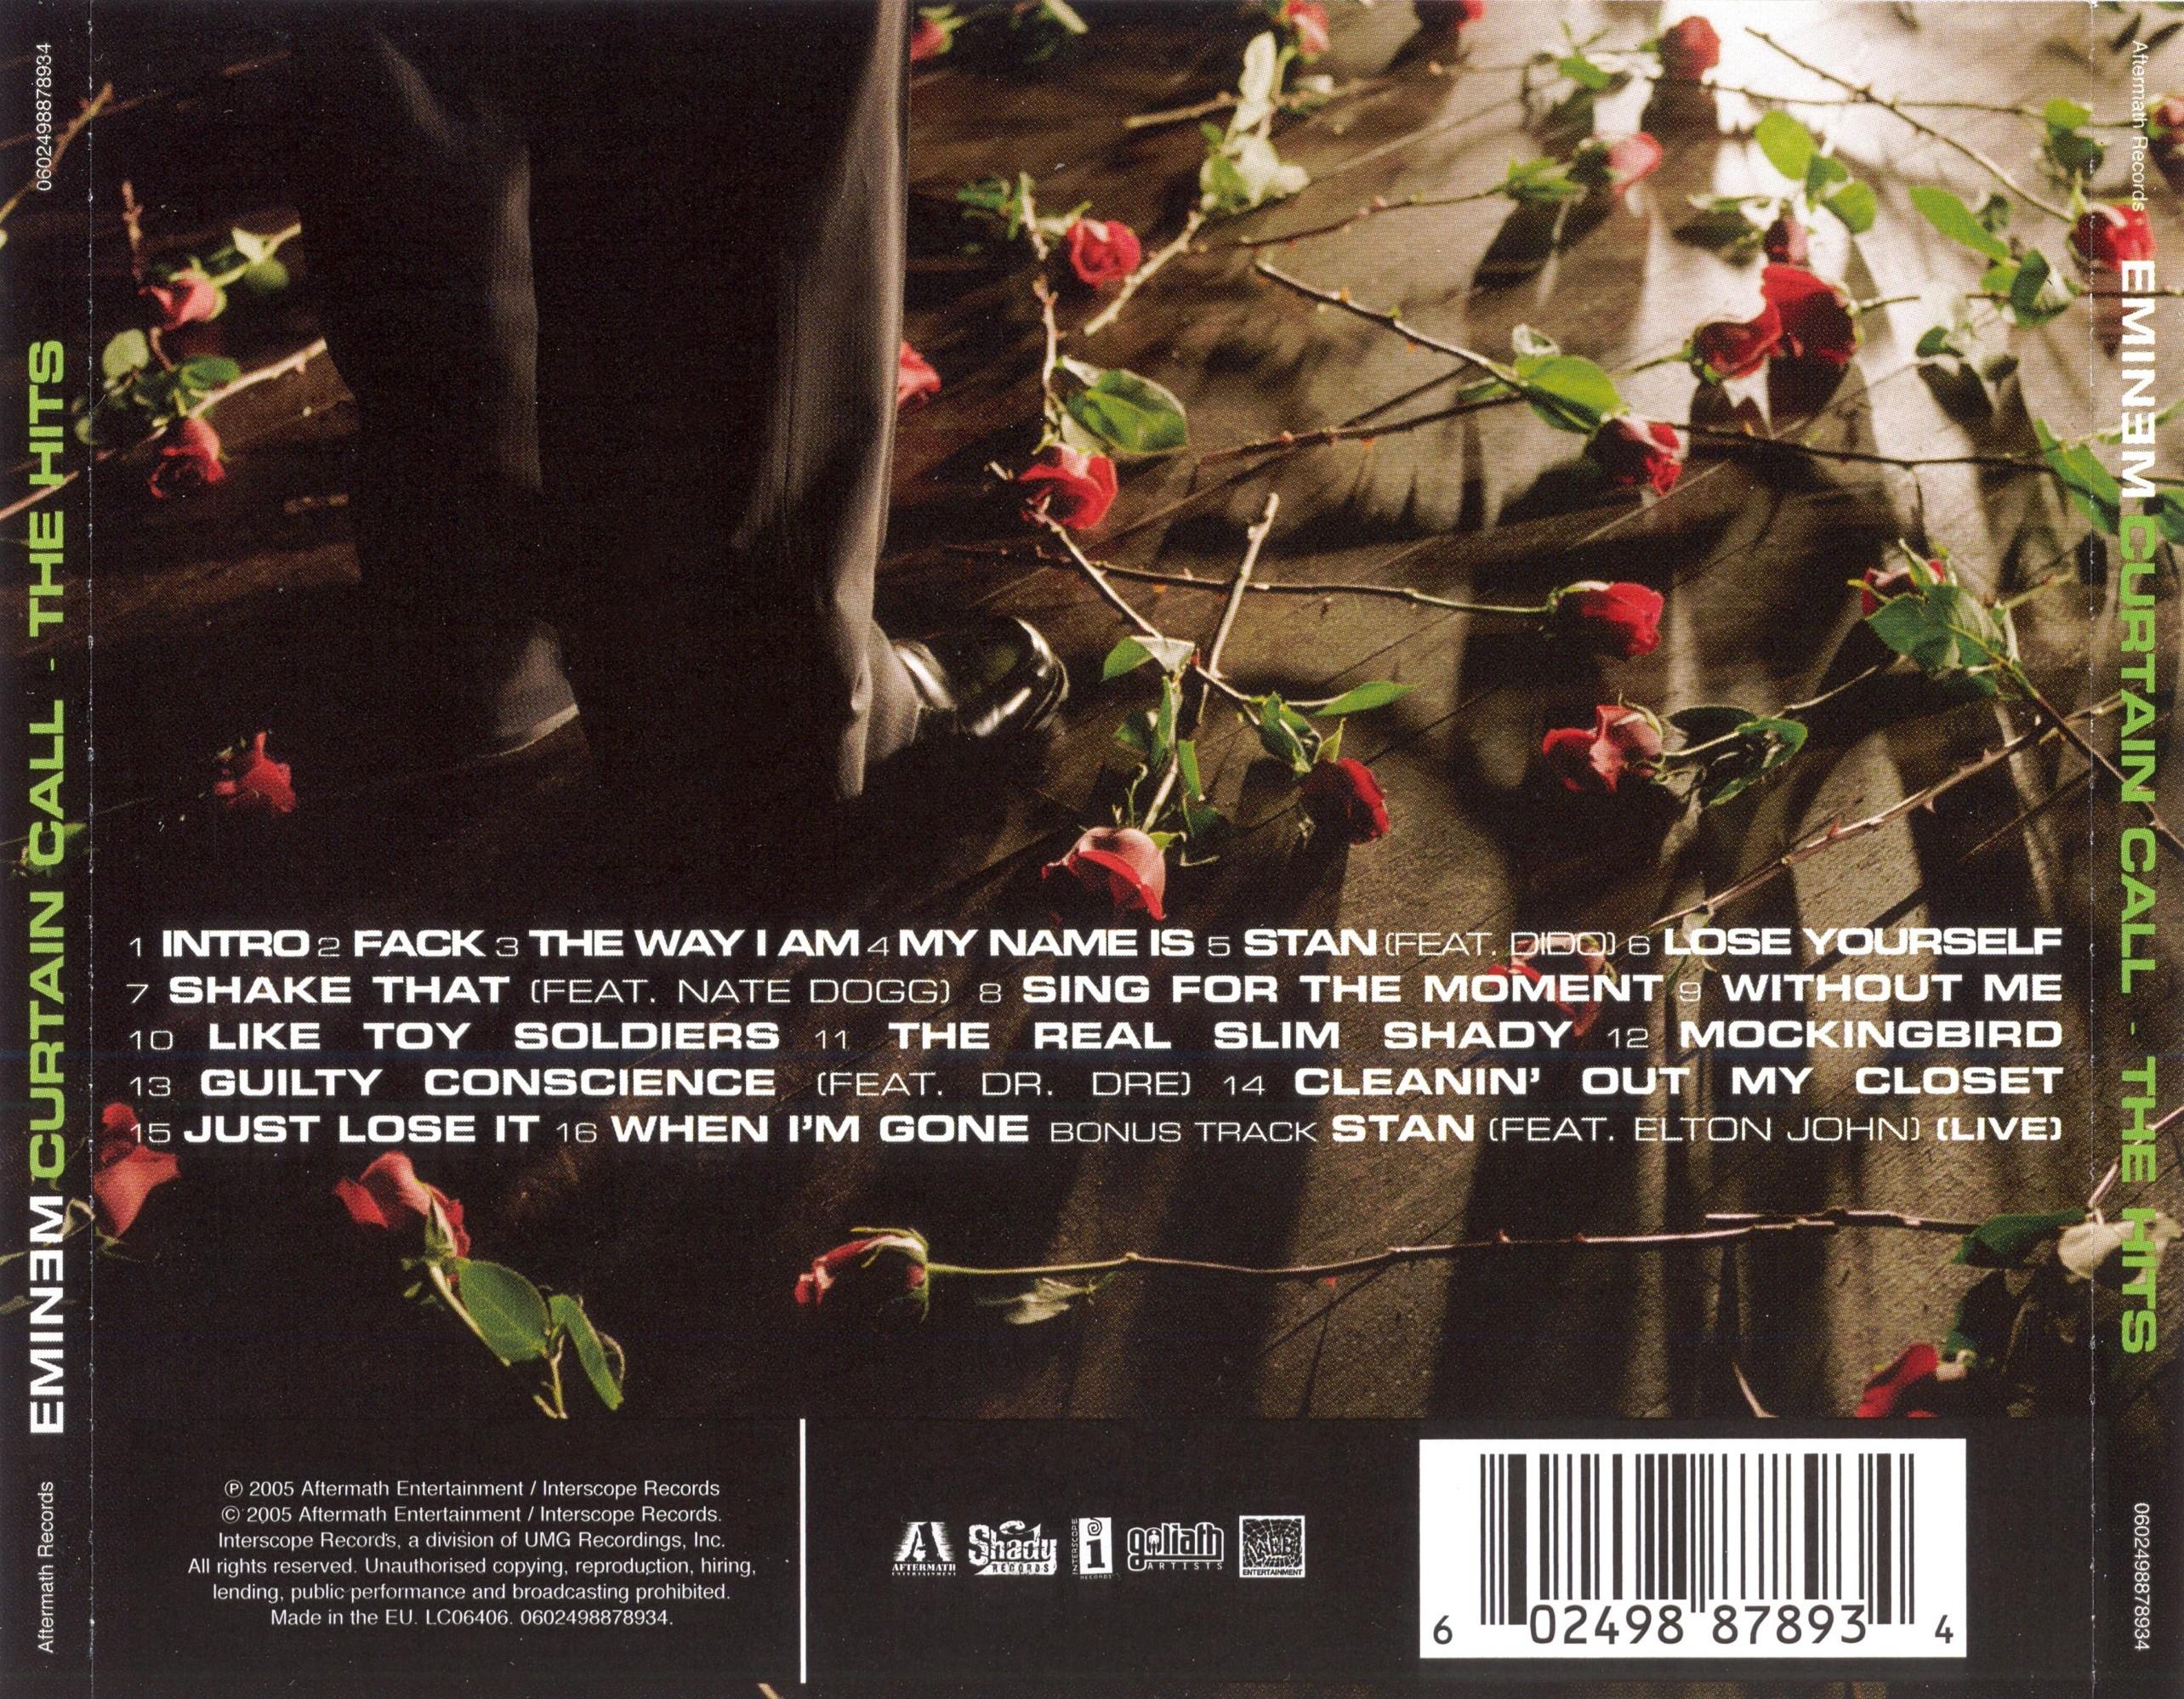 Digipak Analysis Curtain Calls The Hits Eminem A2 Media